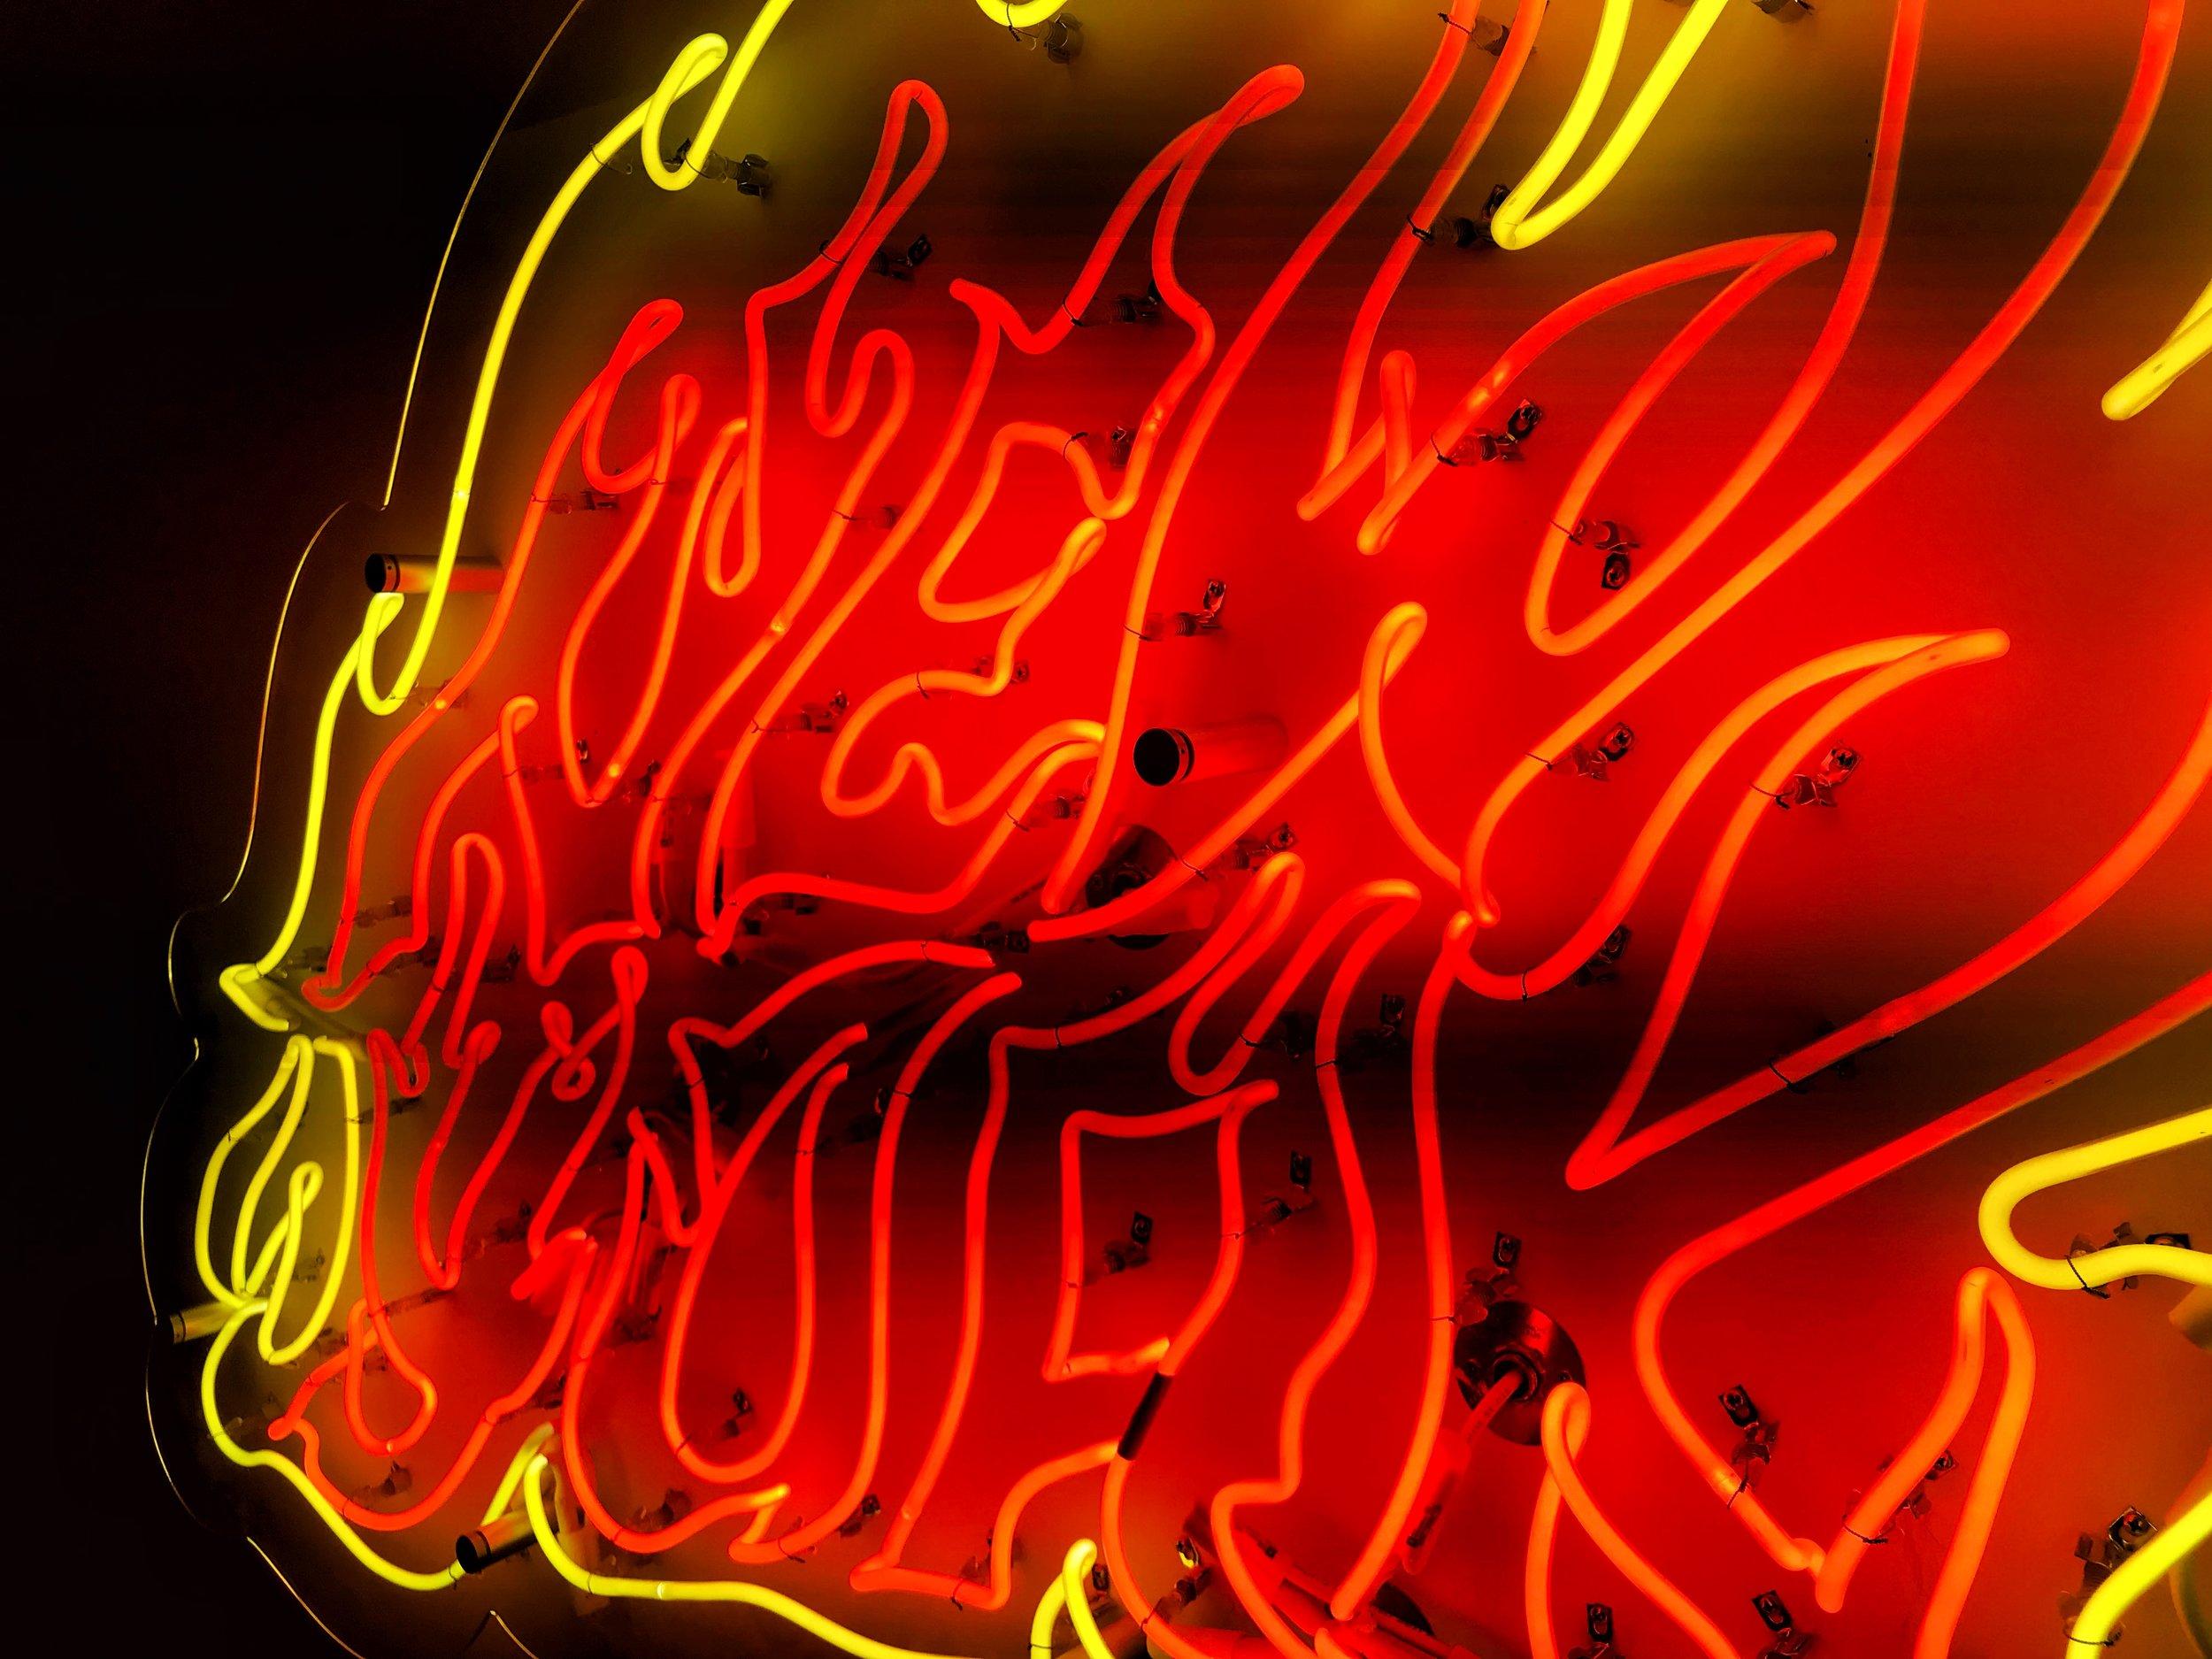 Artwork_85-Broad_New-York-On-Fire_3.JPG